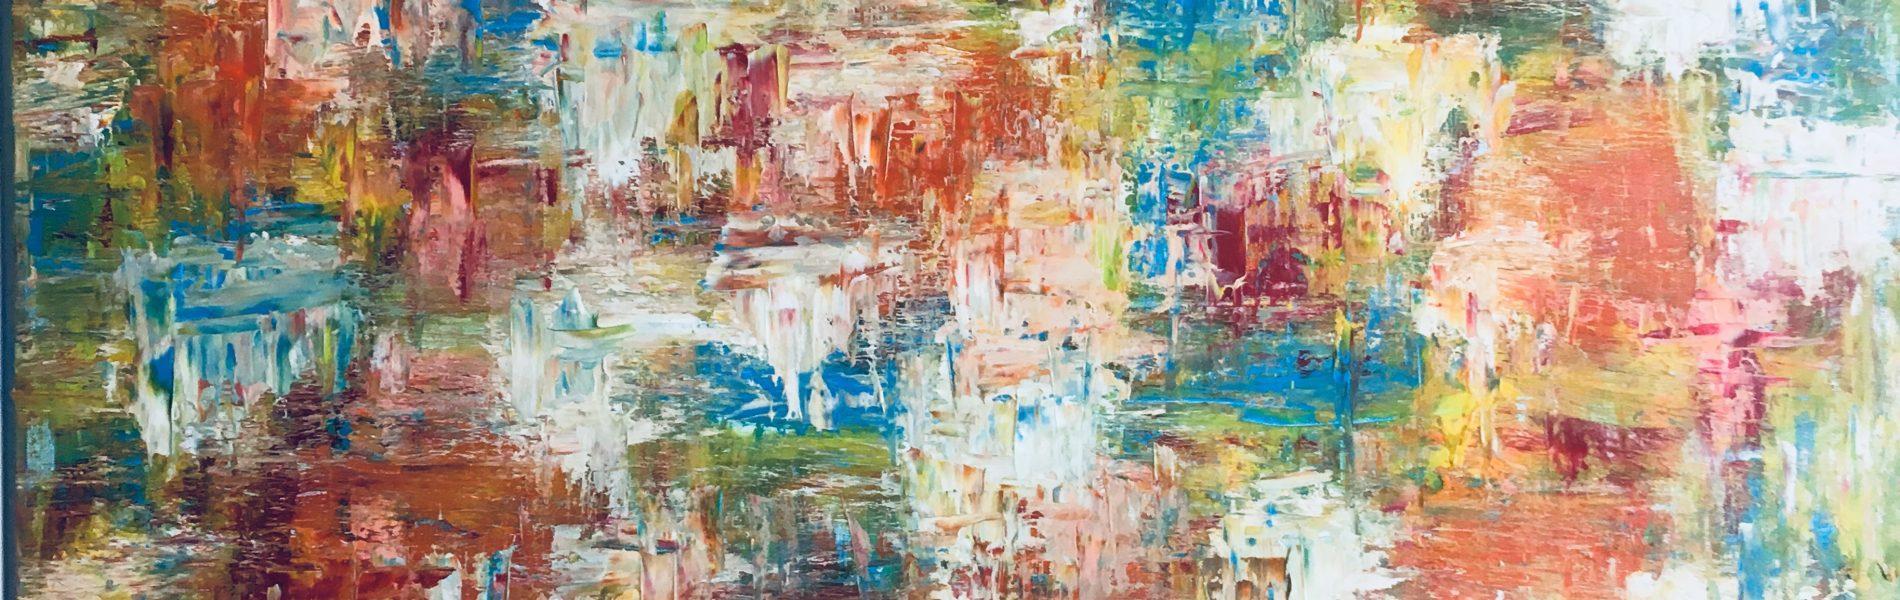 Favoriete Abstracte Kunst – pazzimusic.nl #KB04